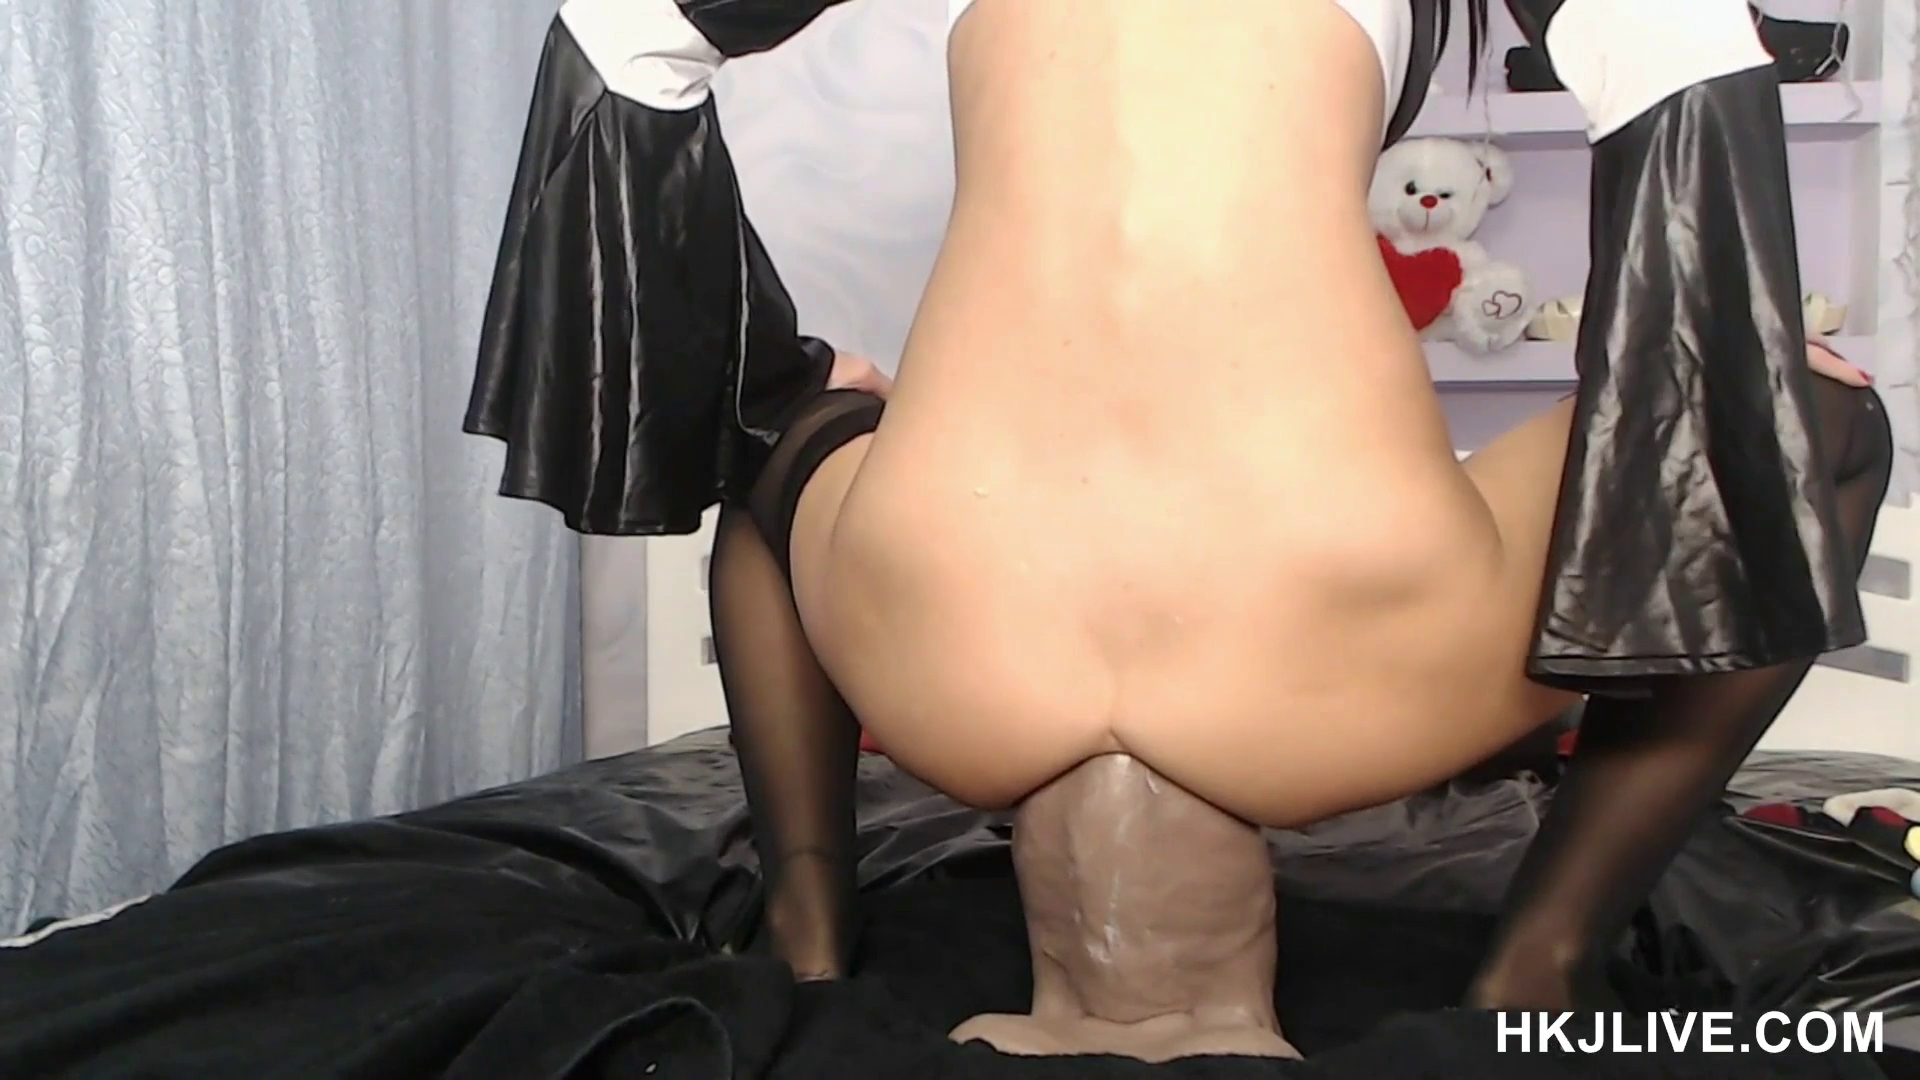 Huge Tits Interracial Anal